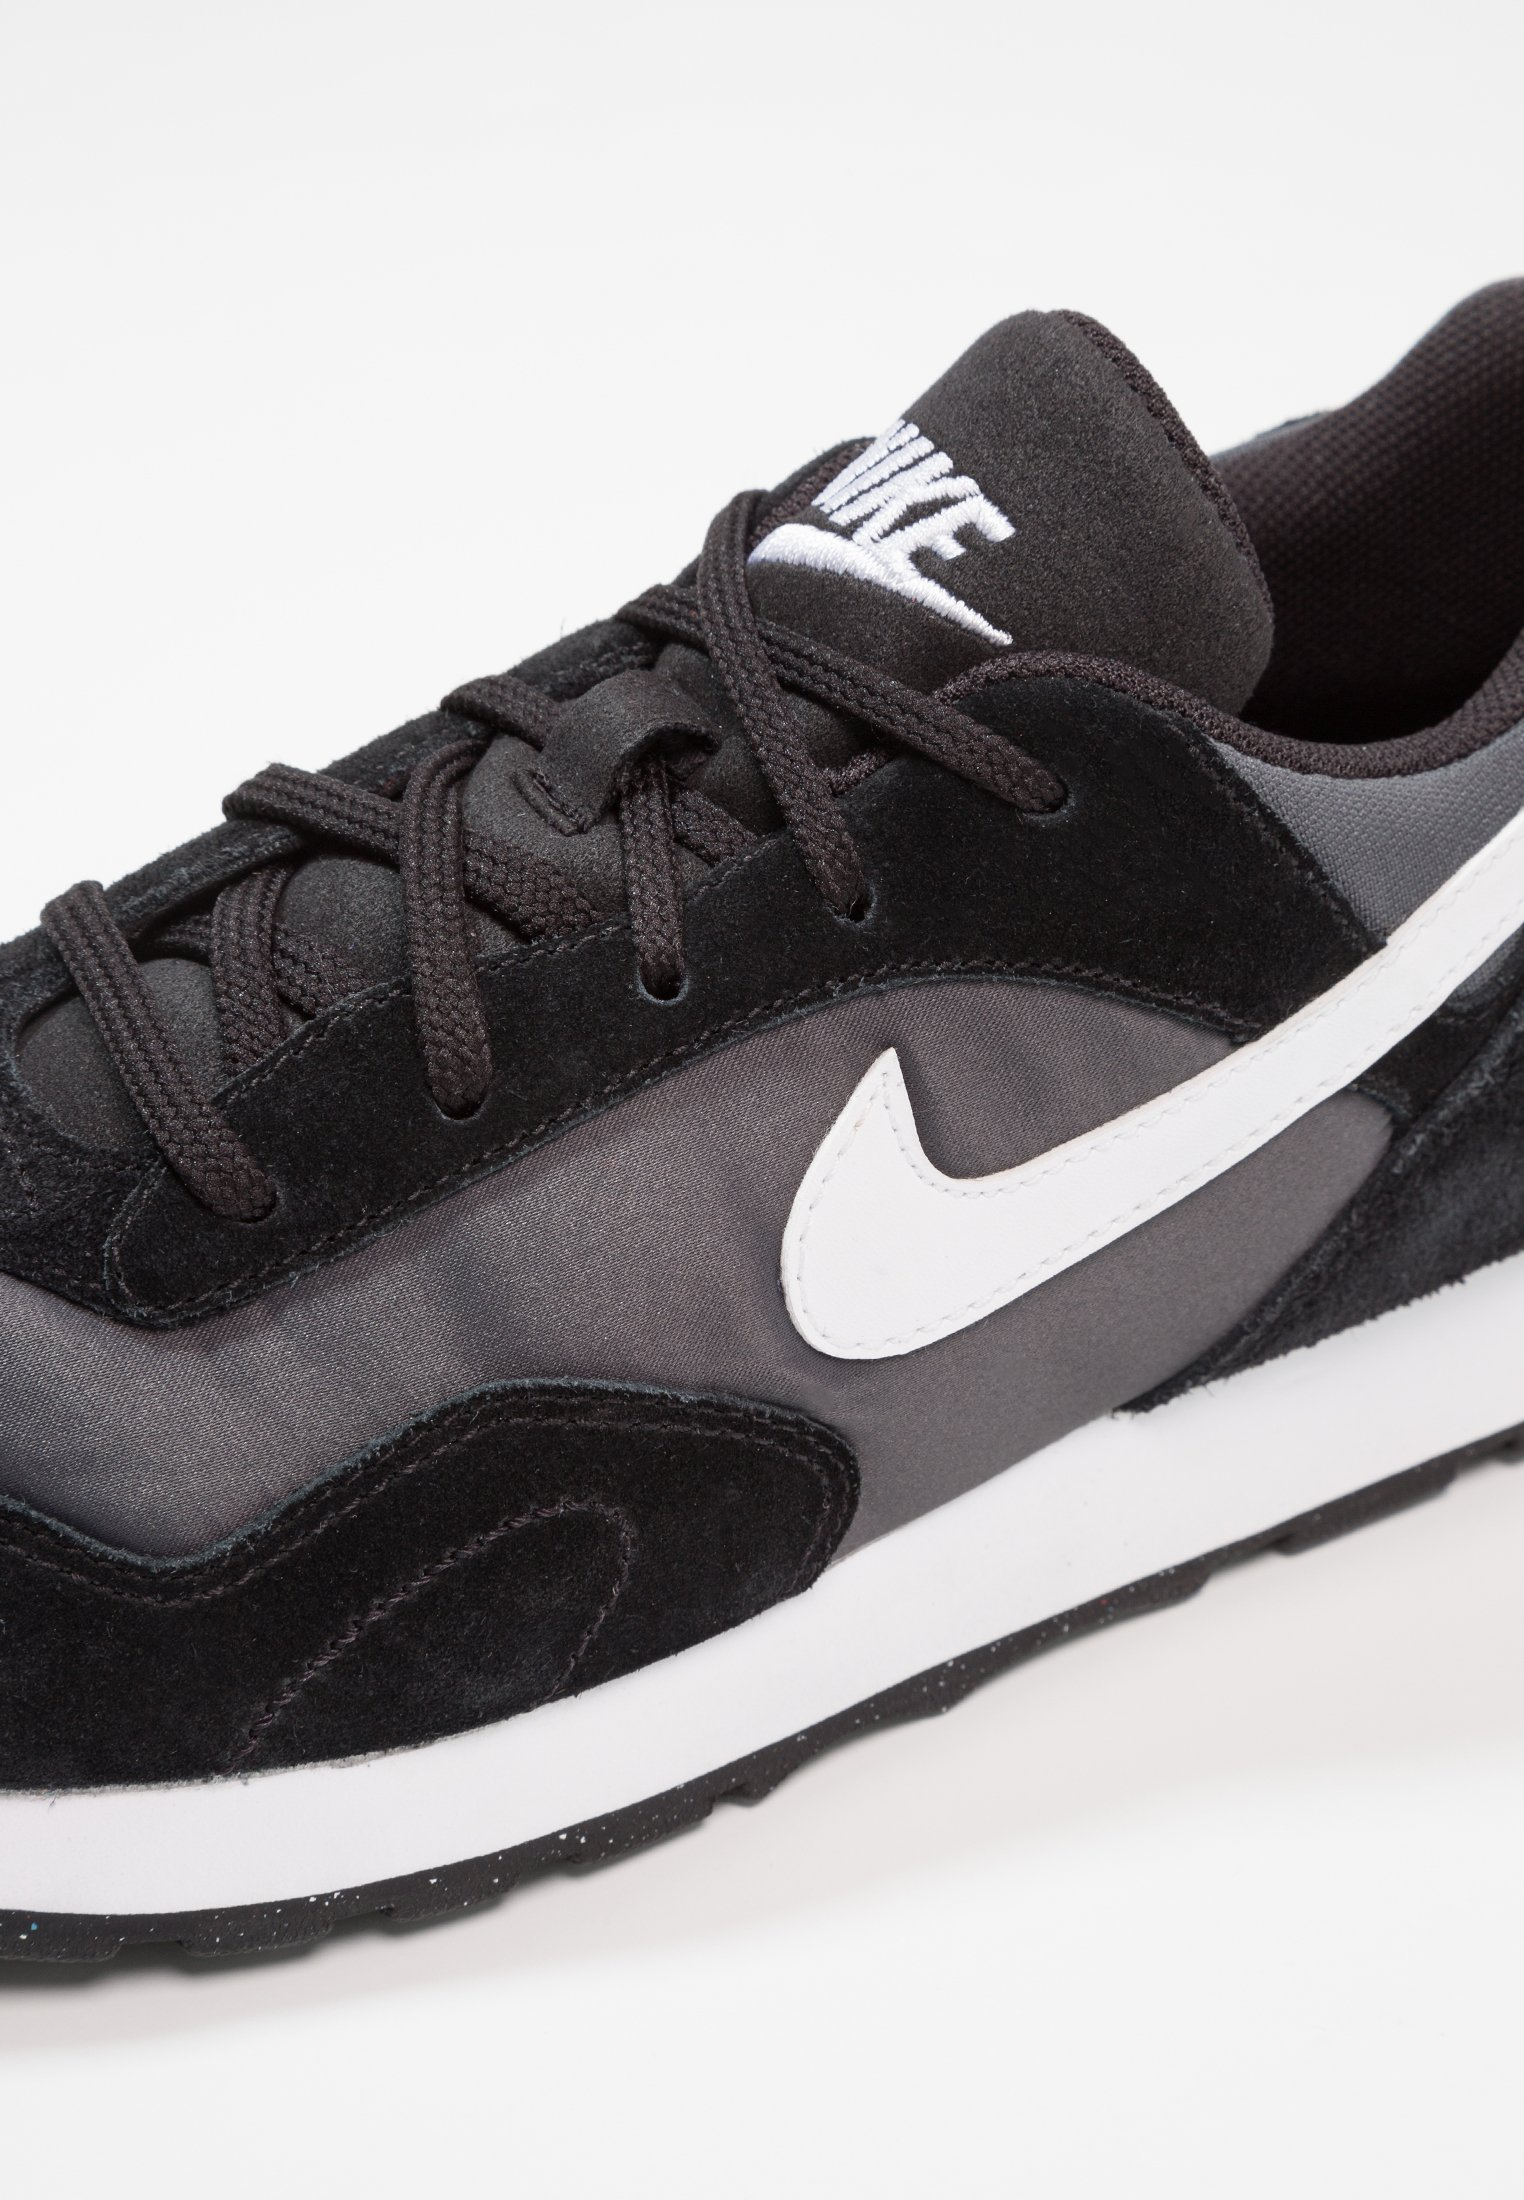 OutburstBaskets Black anthracite Basses Nike Sportswear white OZiuwkTlXP